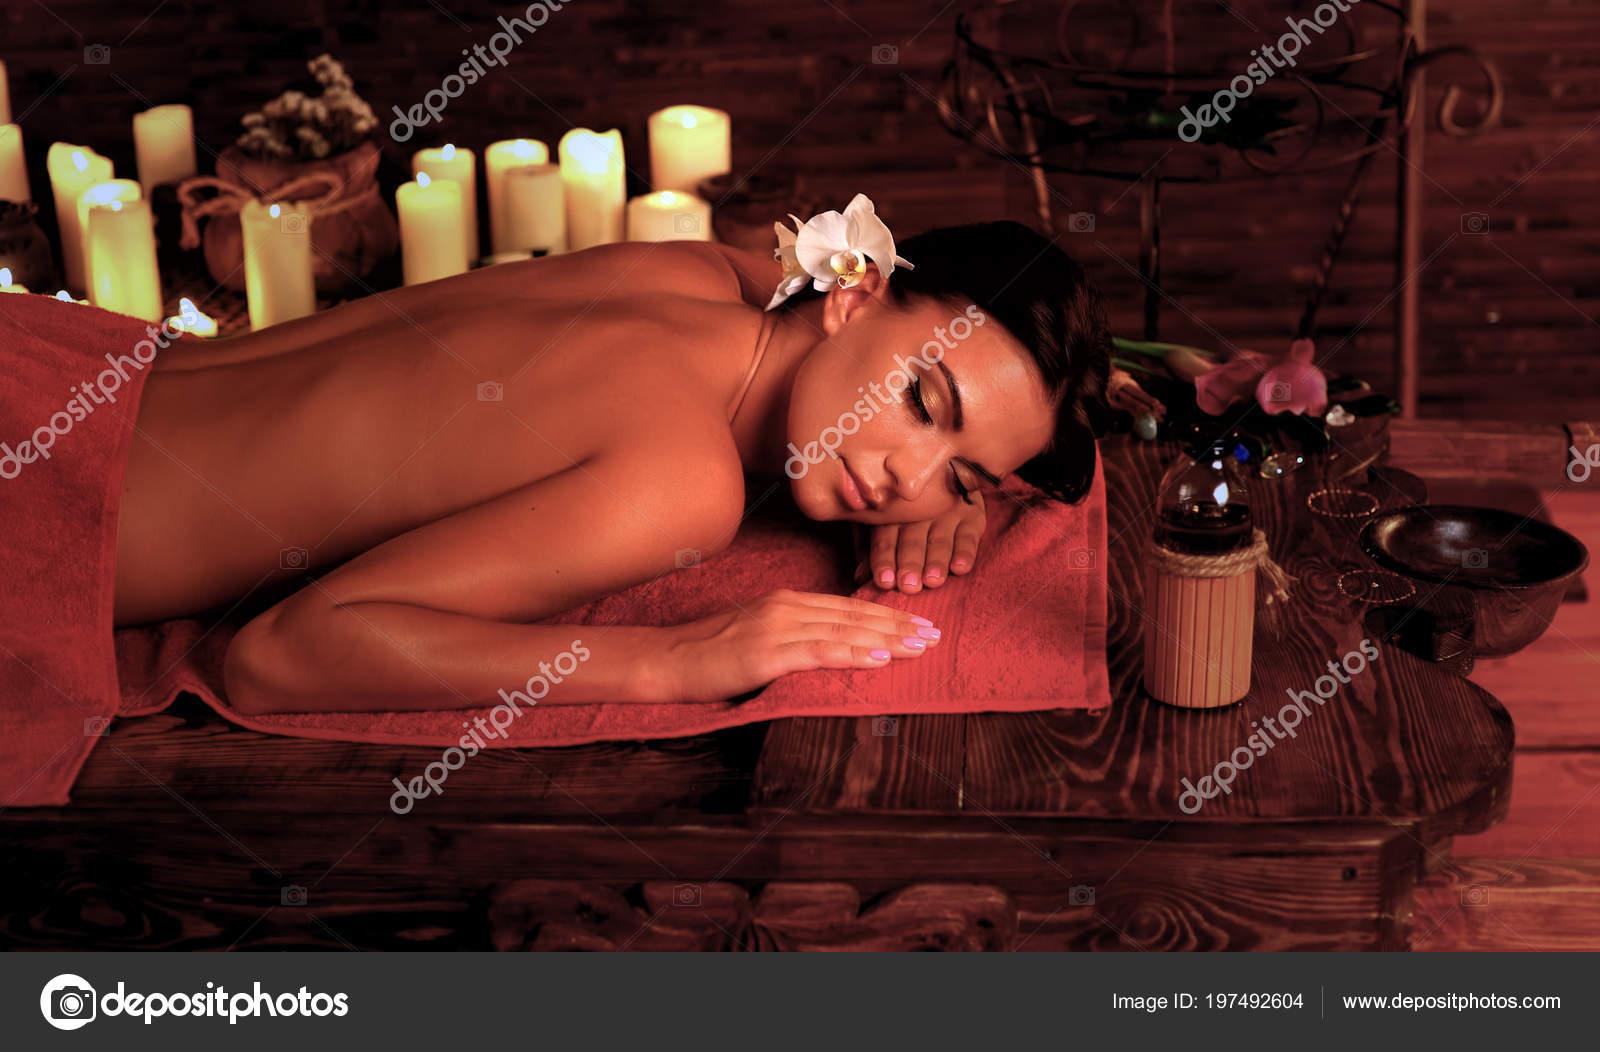 vrouwen fotos erotic massage massage